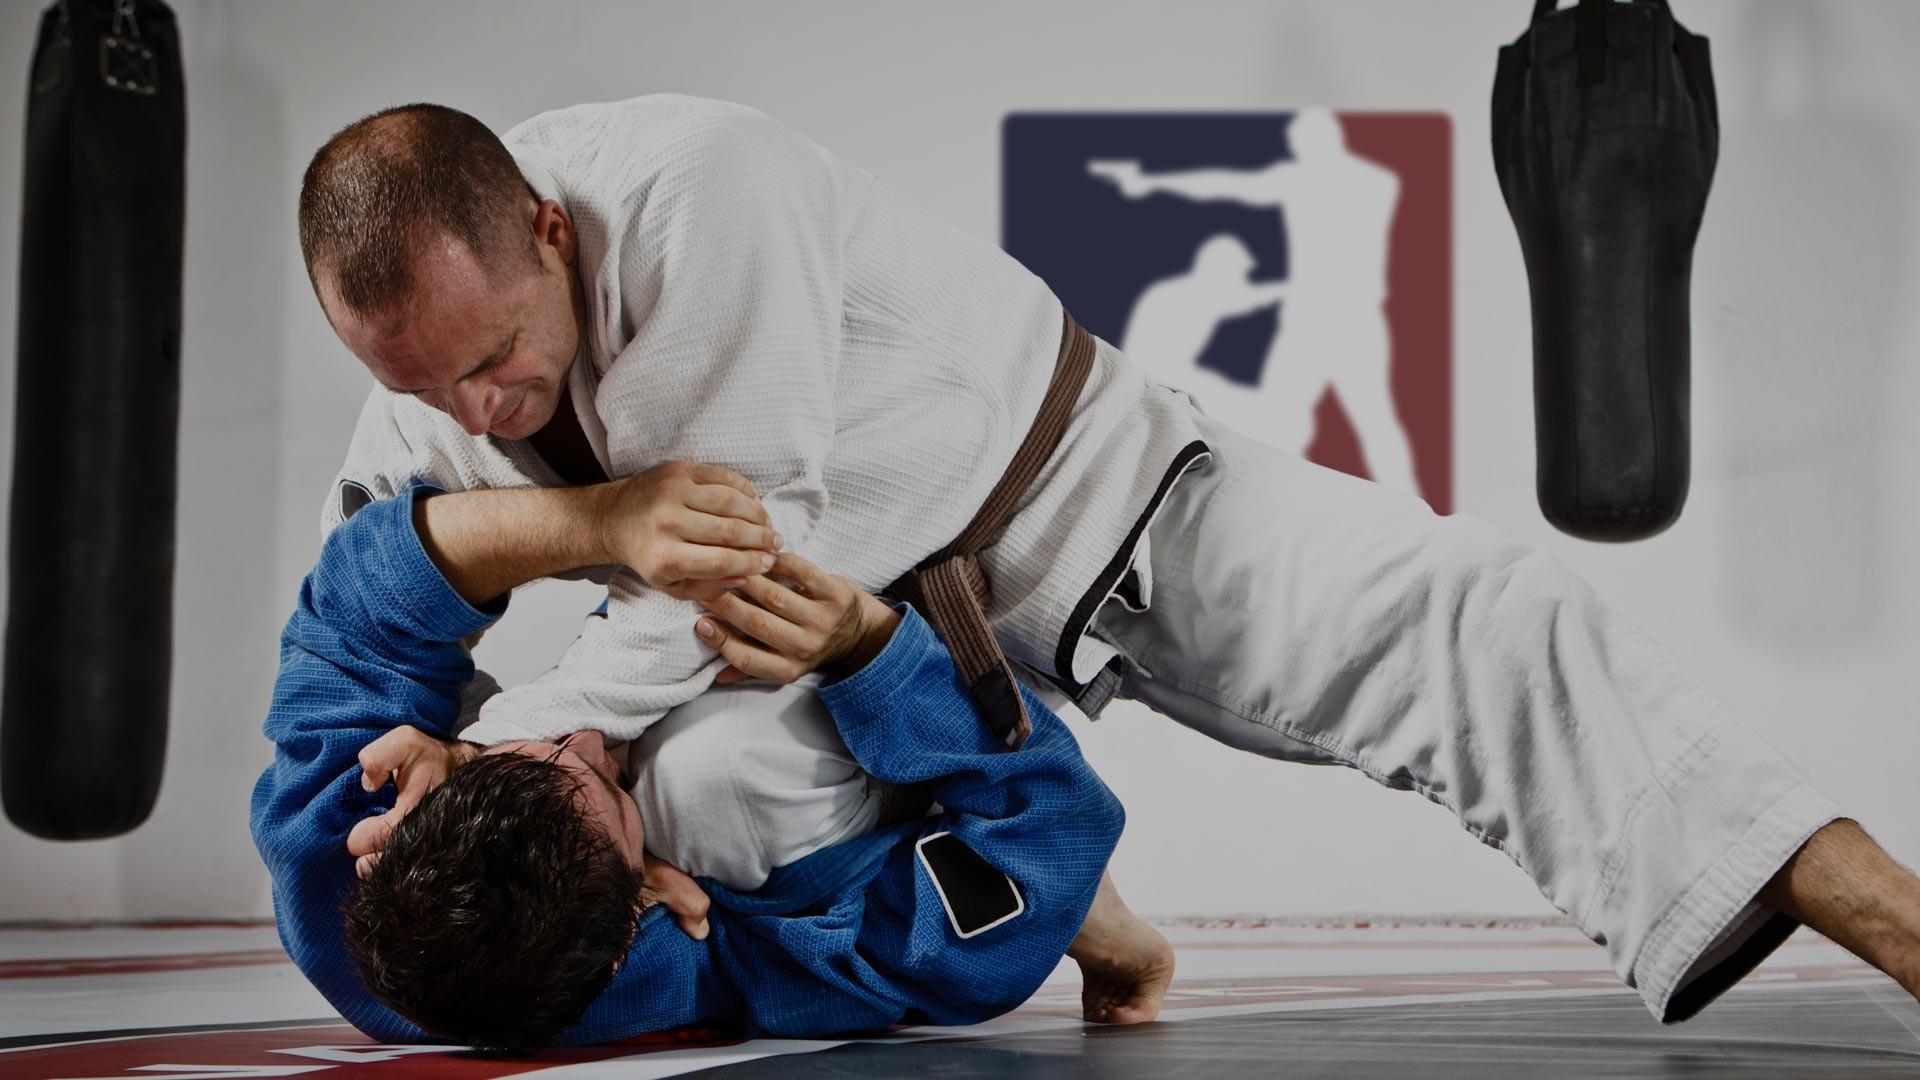 essay on brazilian jiu jitsu Brazilian jiu-jitsu romulo melo bjj practices and teaches traditional gracie jiu-jitsu for fitness, competition, and self-defense.